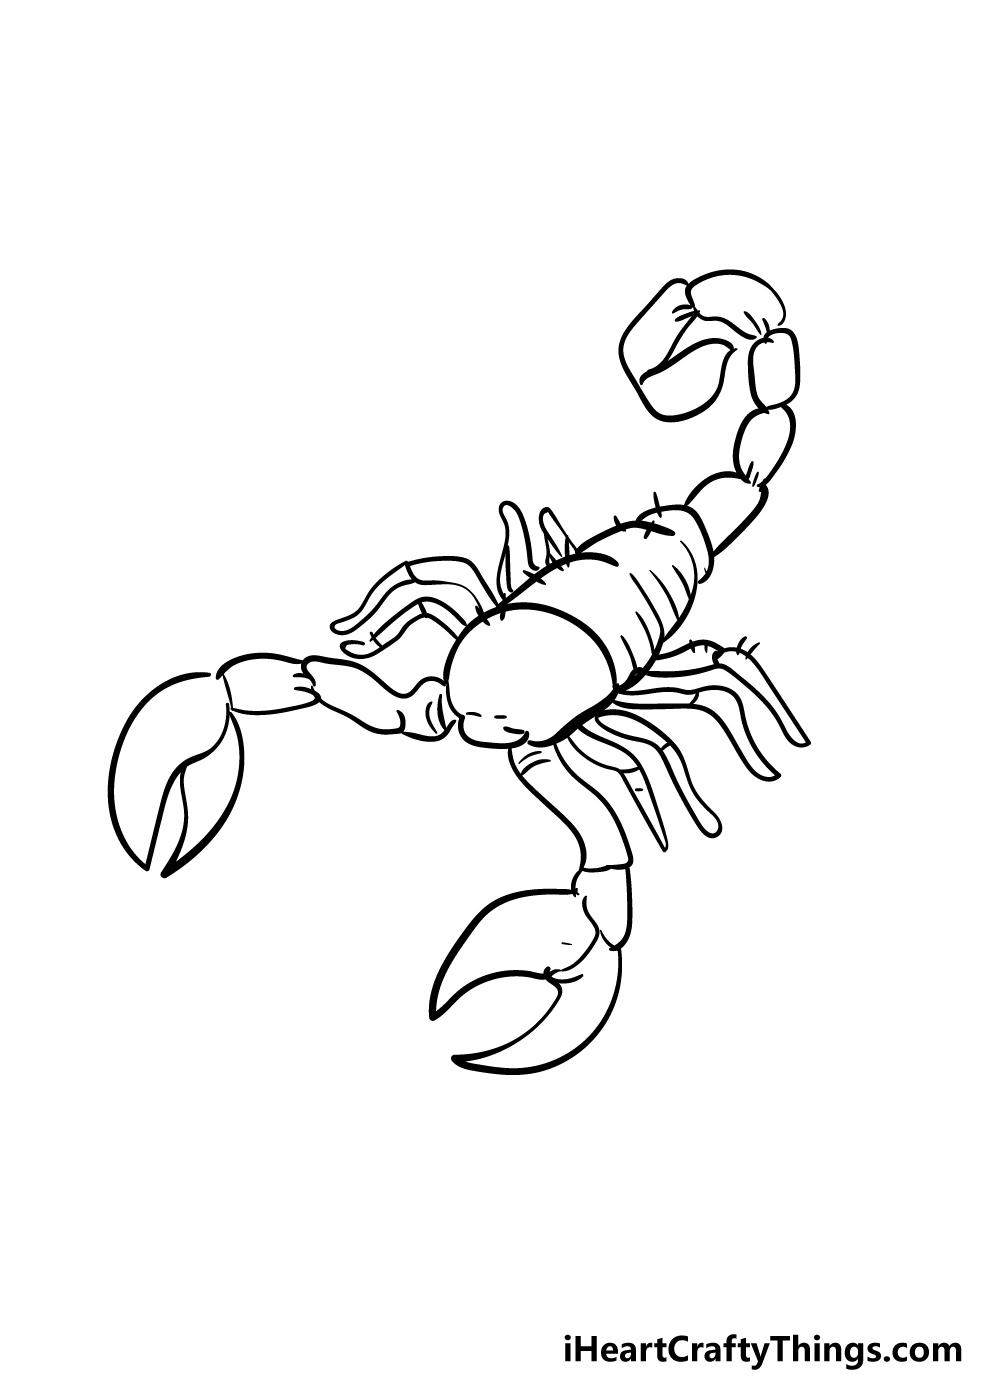 scorpion drawing step 5